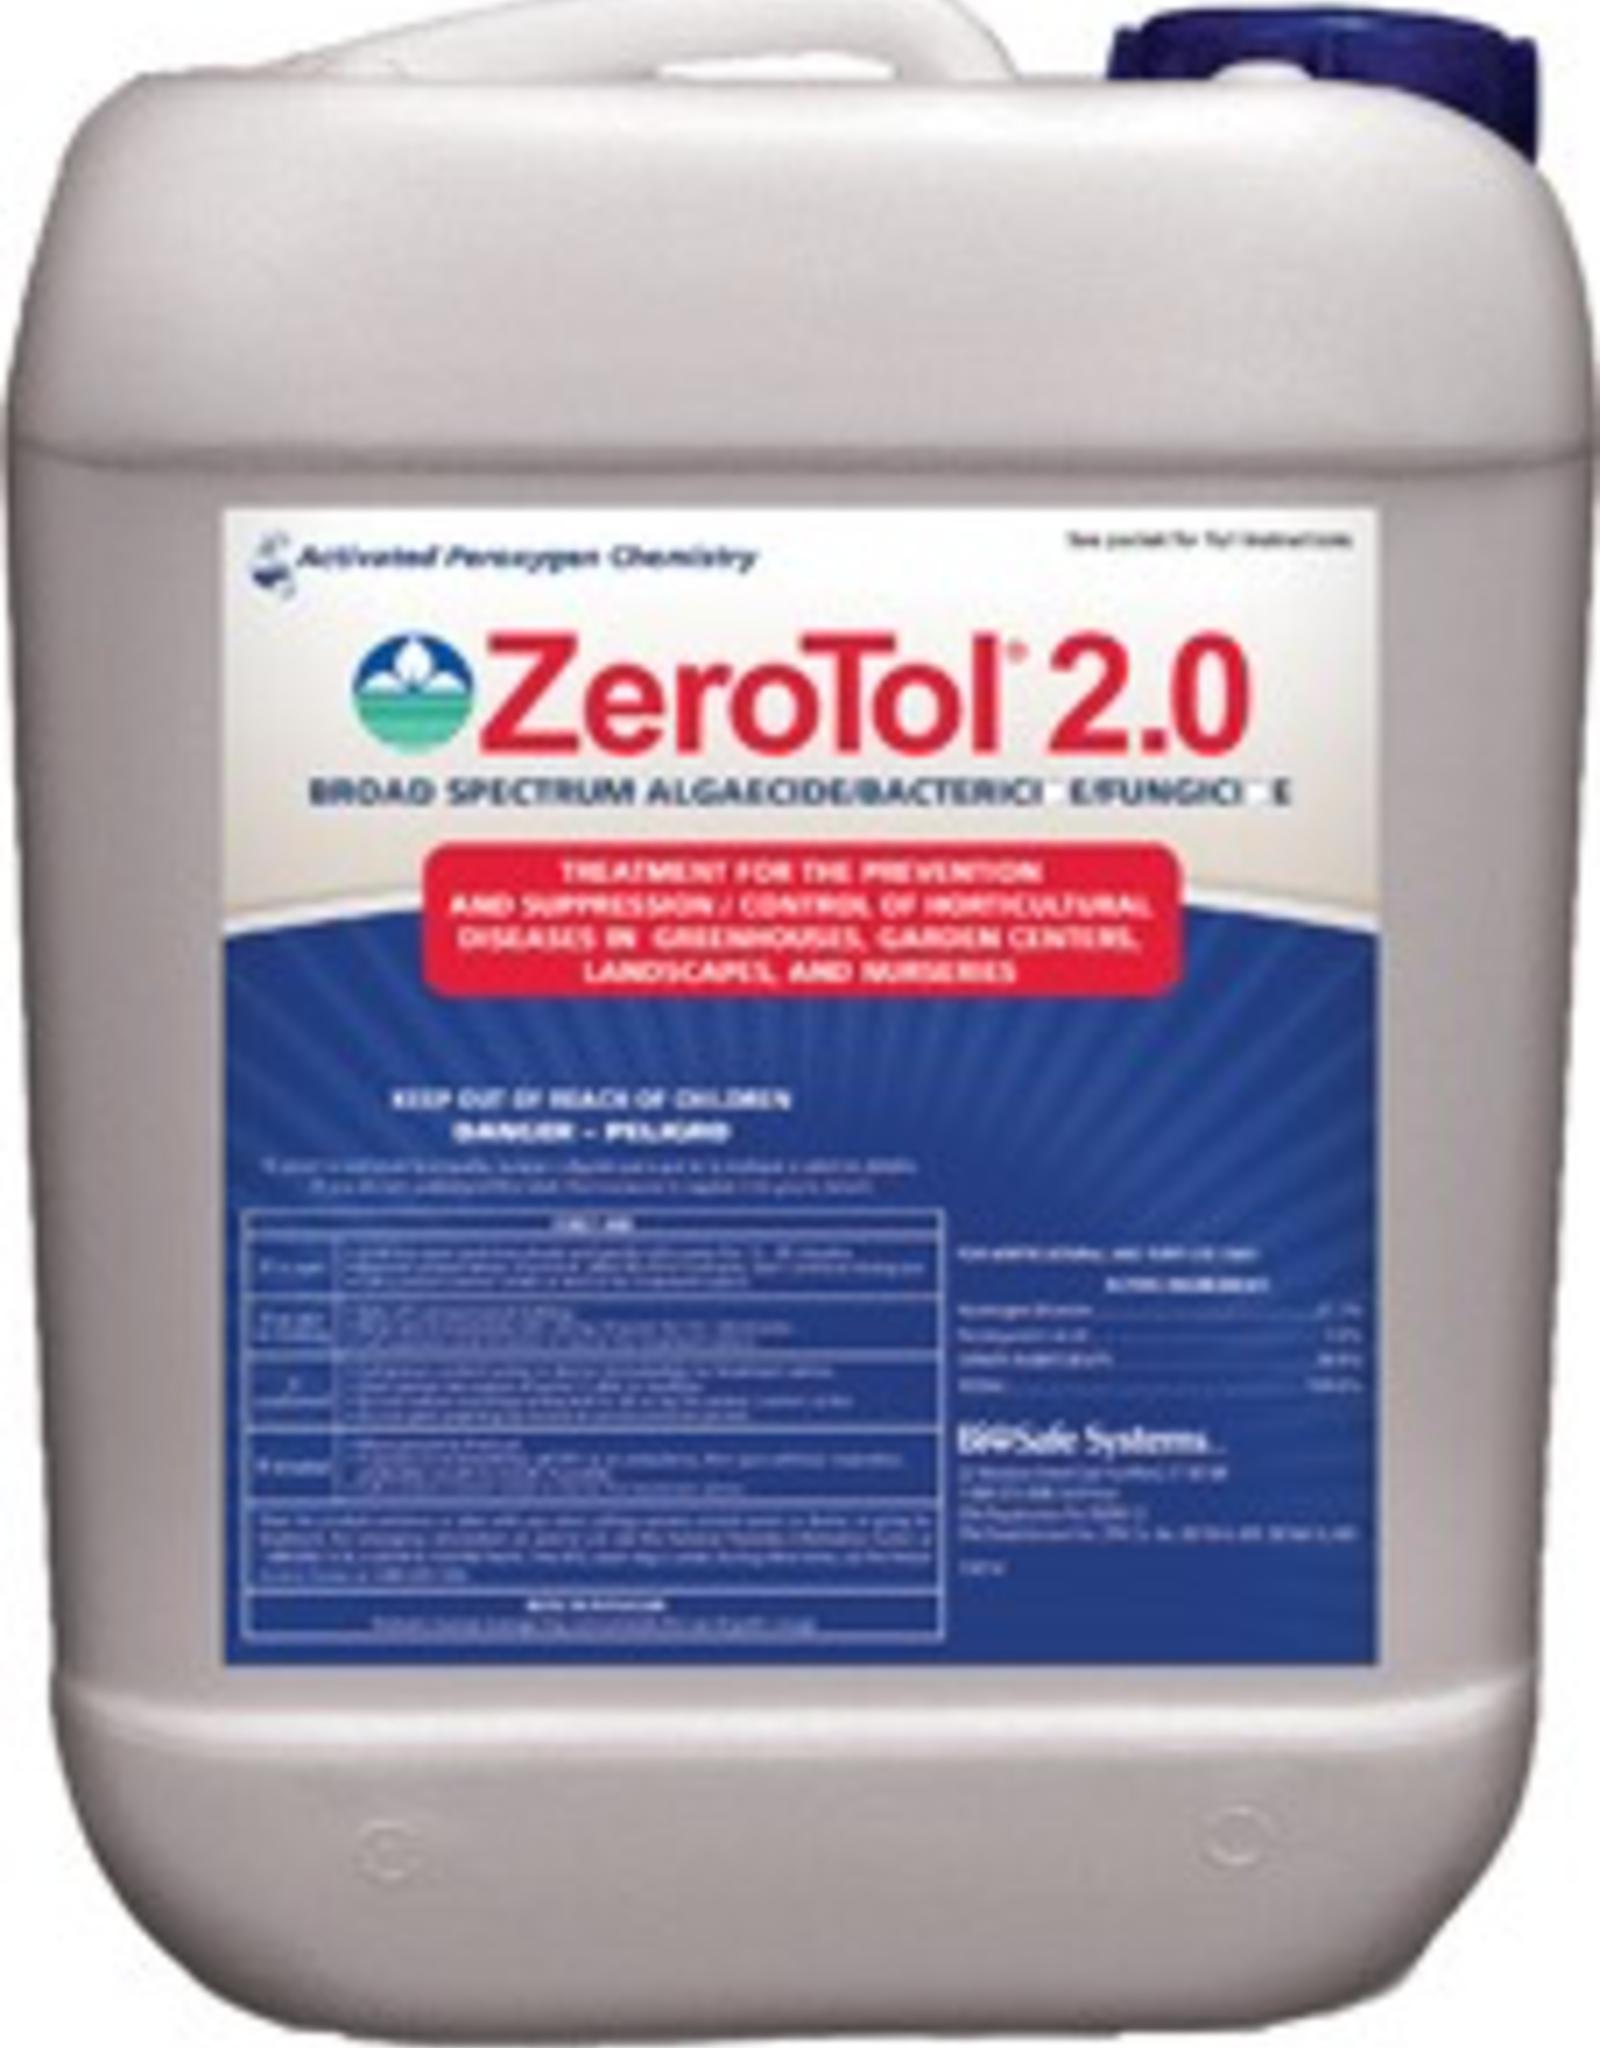 Biosafe CHZEROTOL